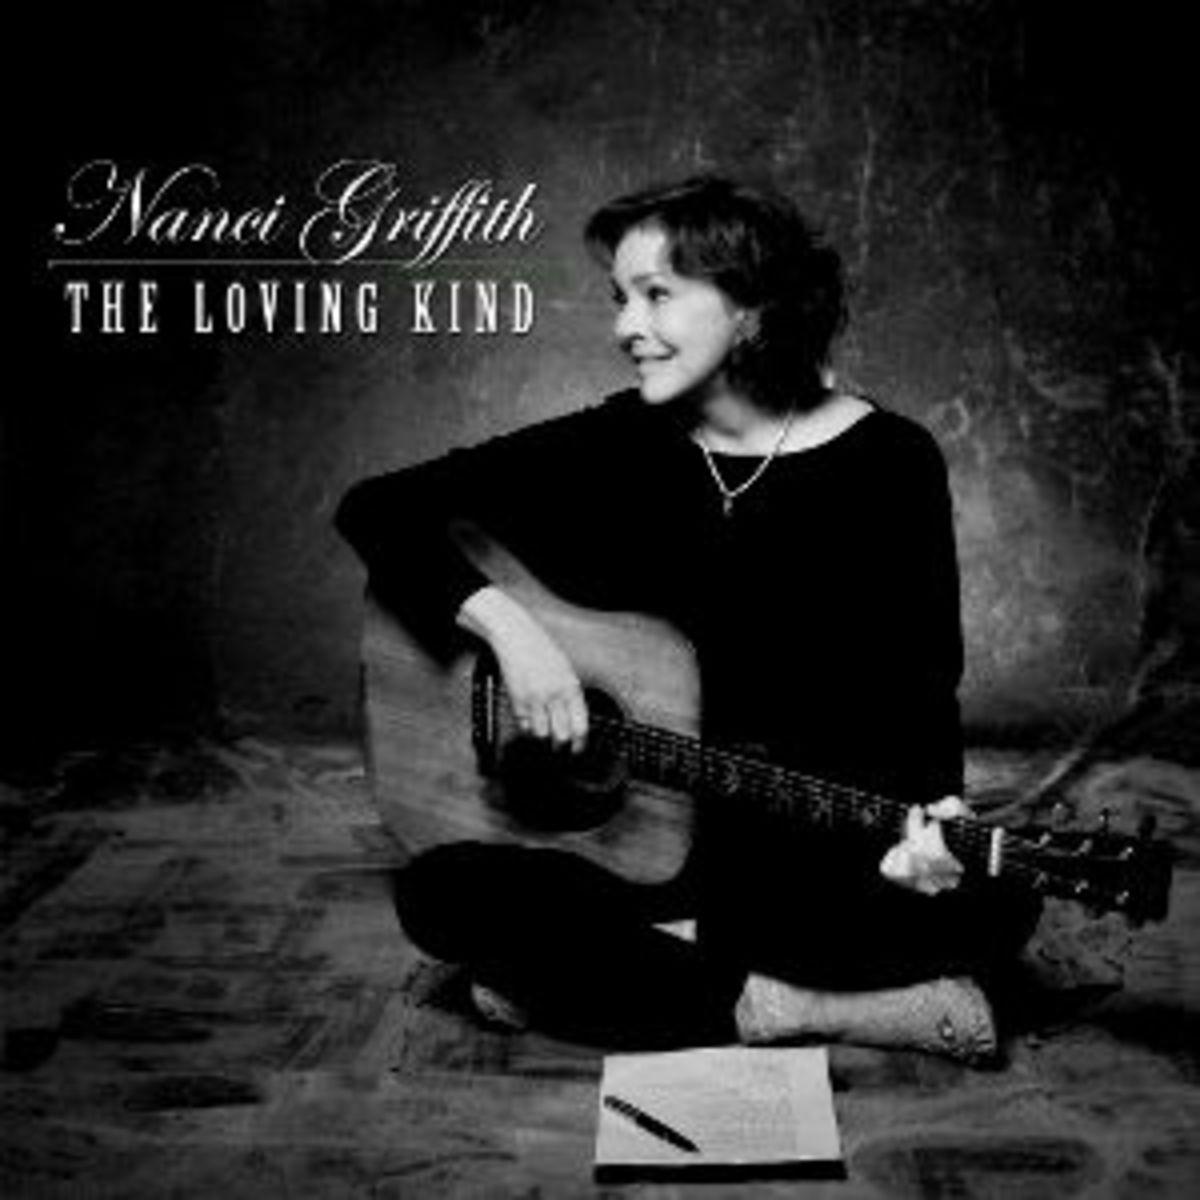 The Loving Kind